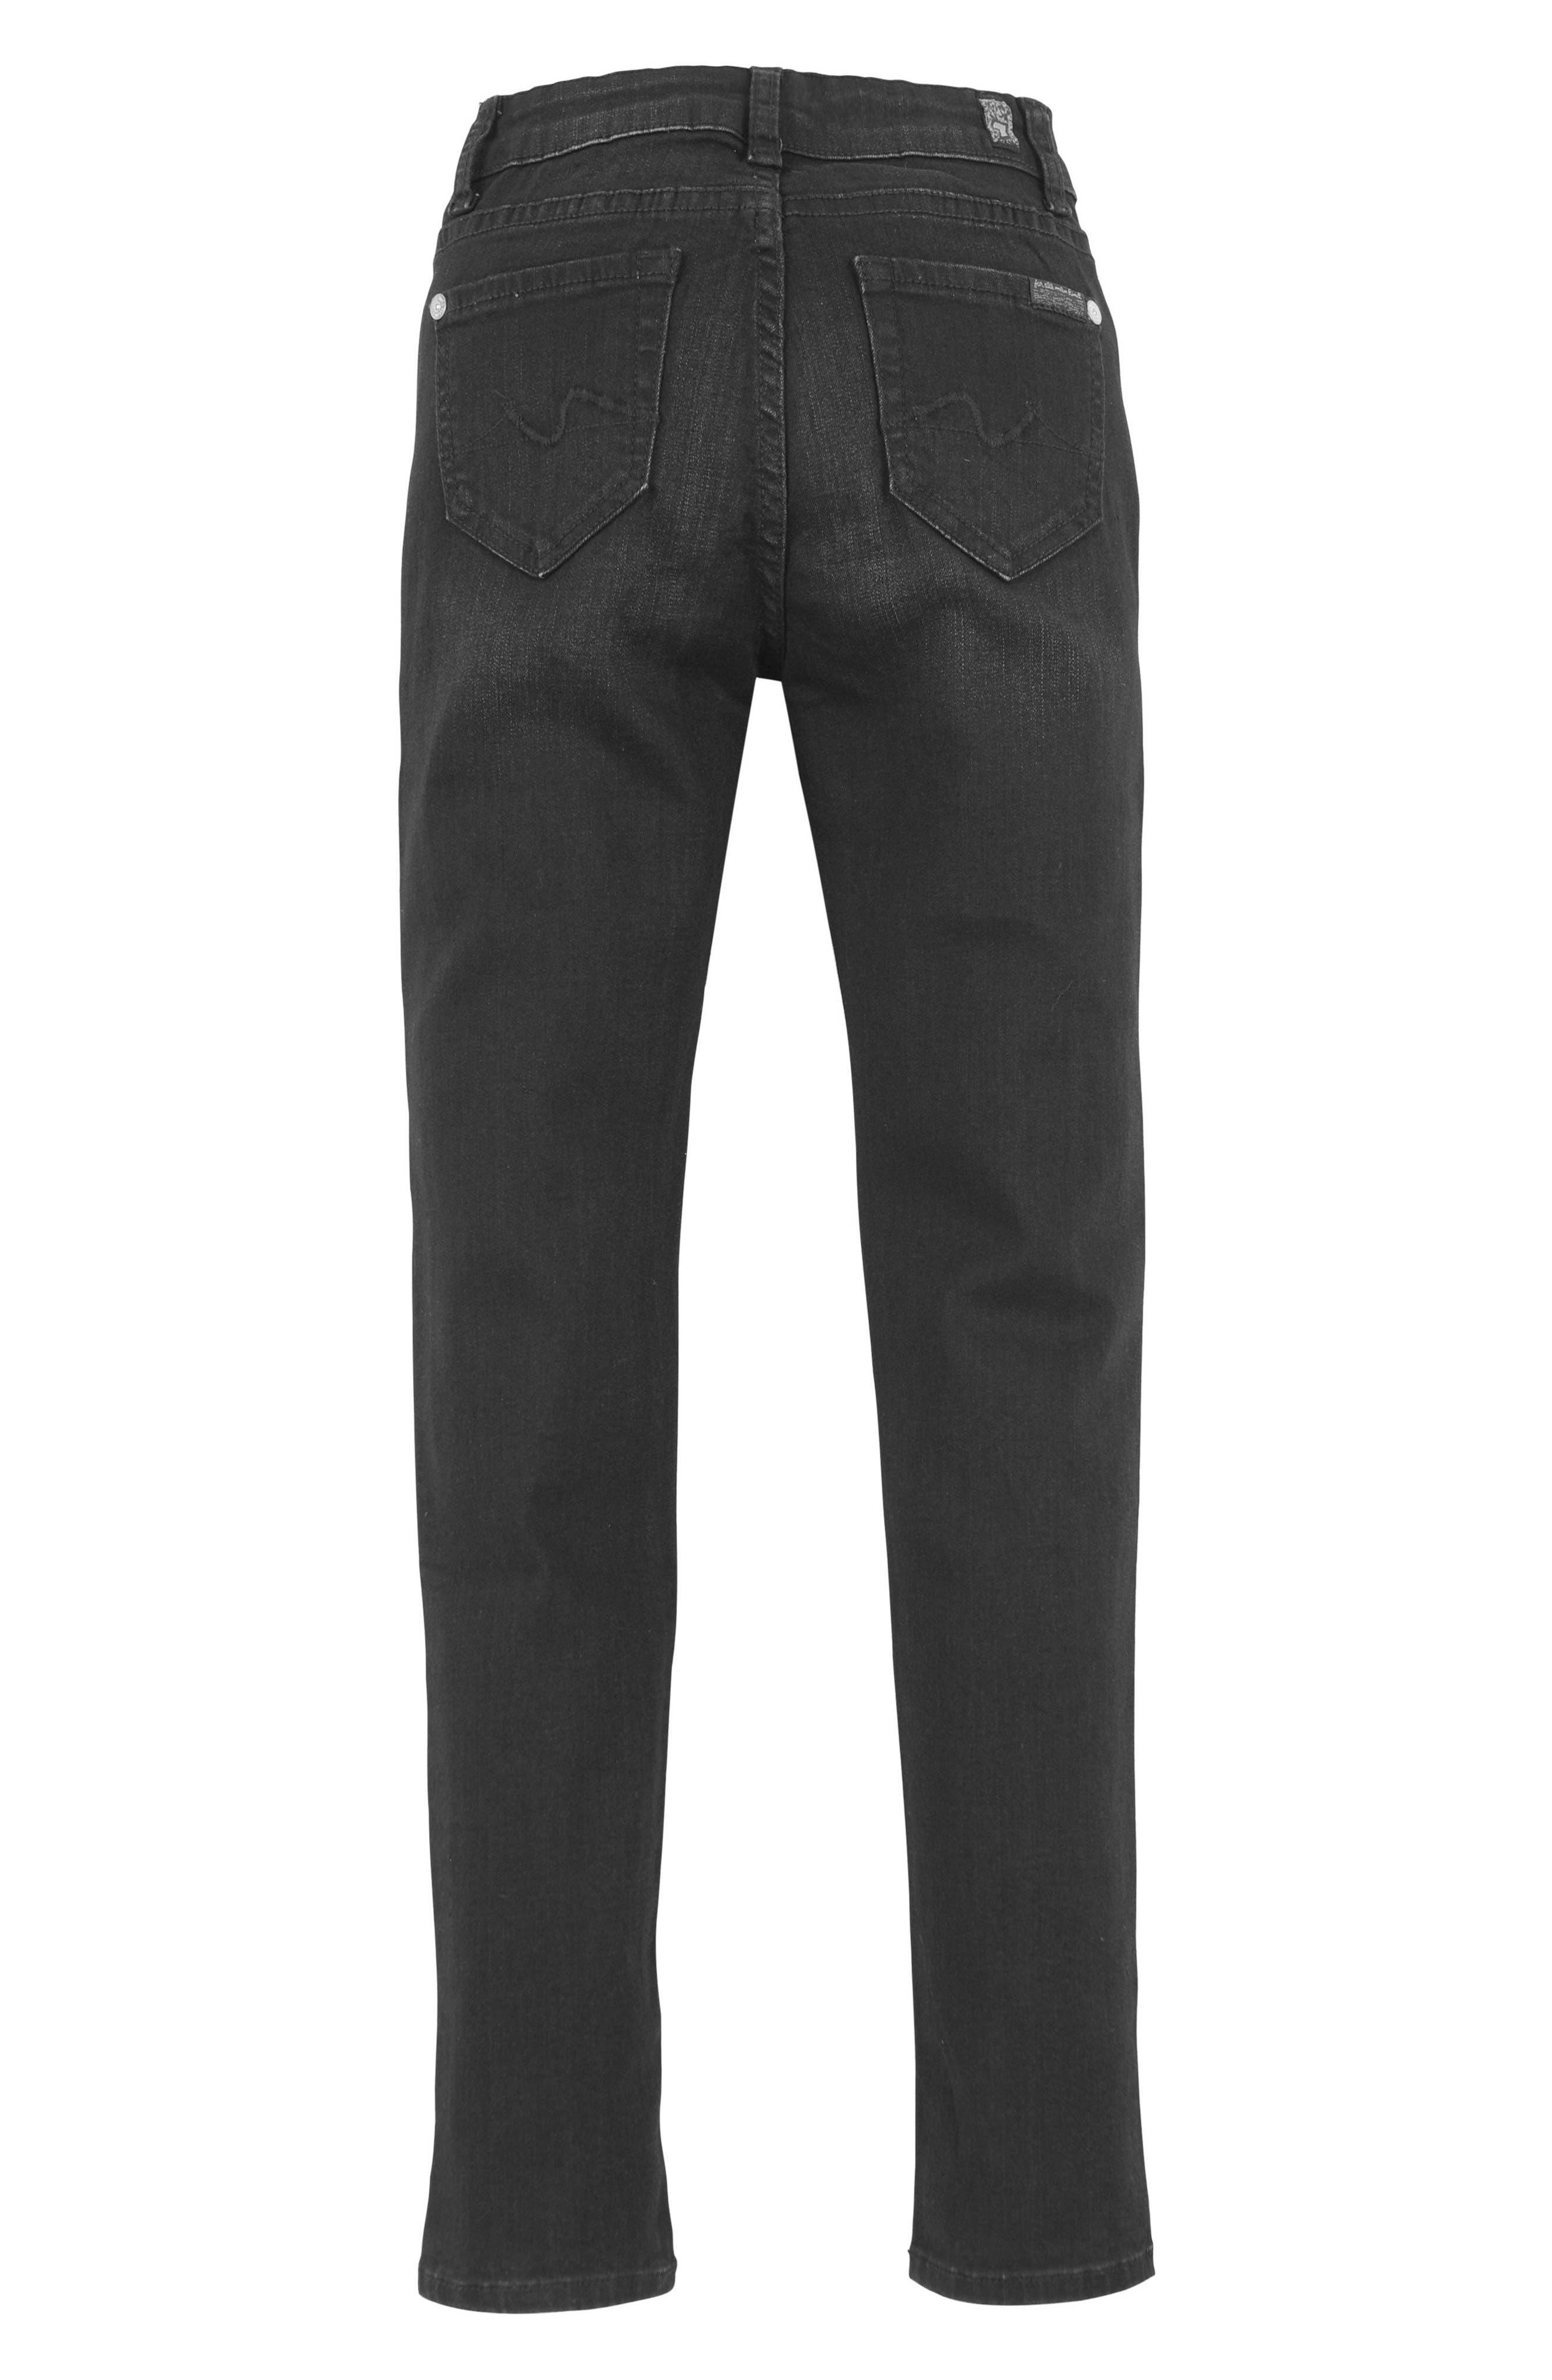 'Slimmy' Jeans,                             Alternate thumbnail 9, color,